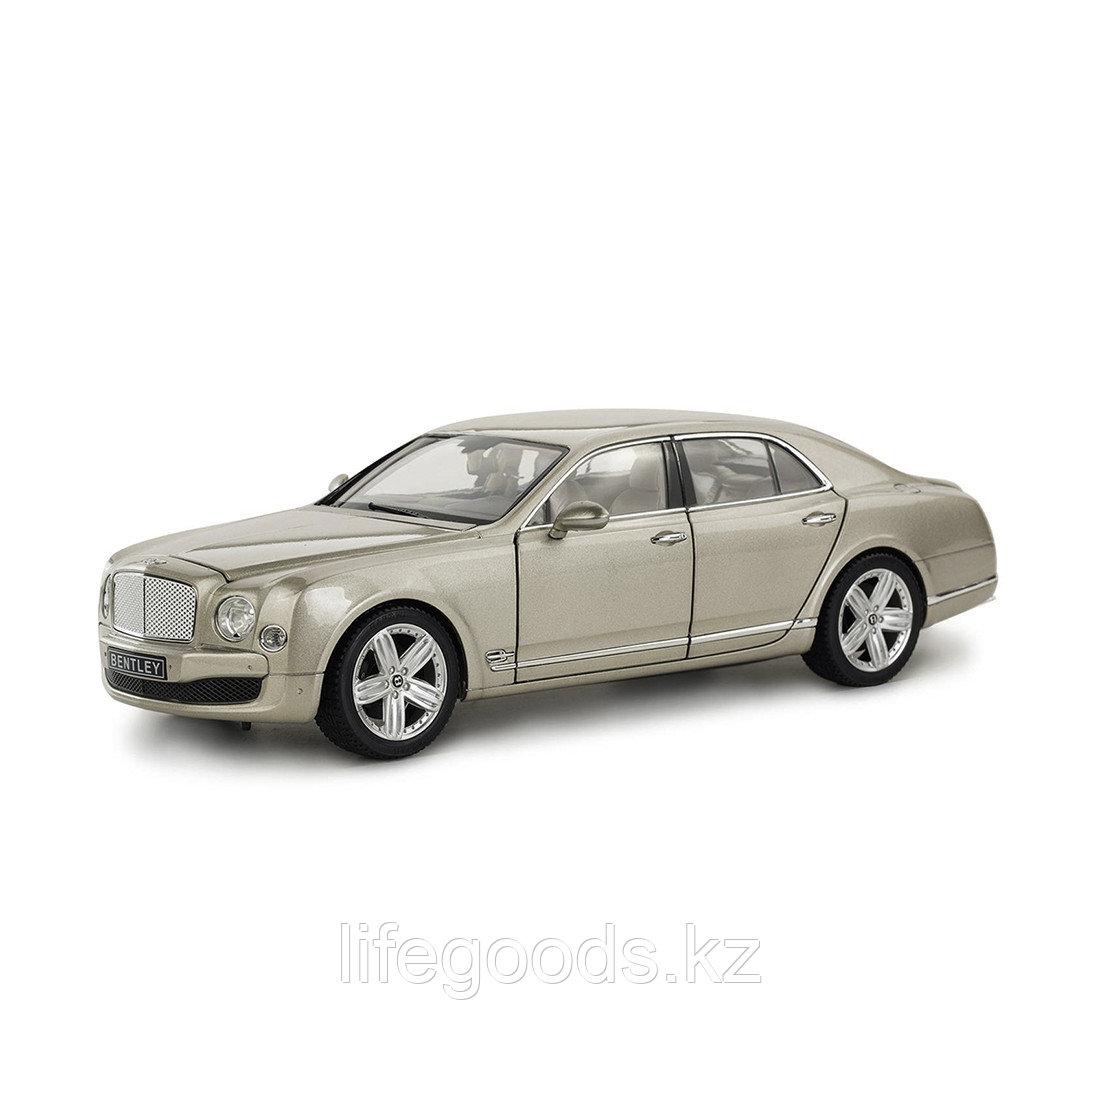 Металлическая машинка RASTAR 1:18 Bentley Mulsanne 43800Ch